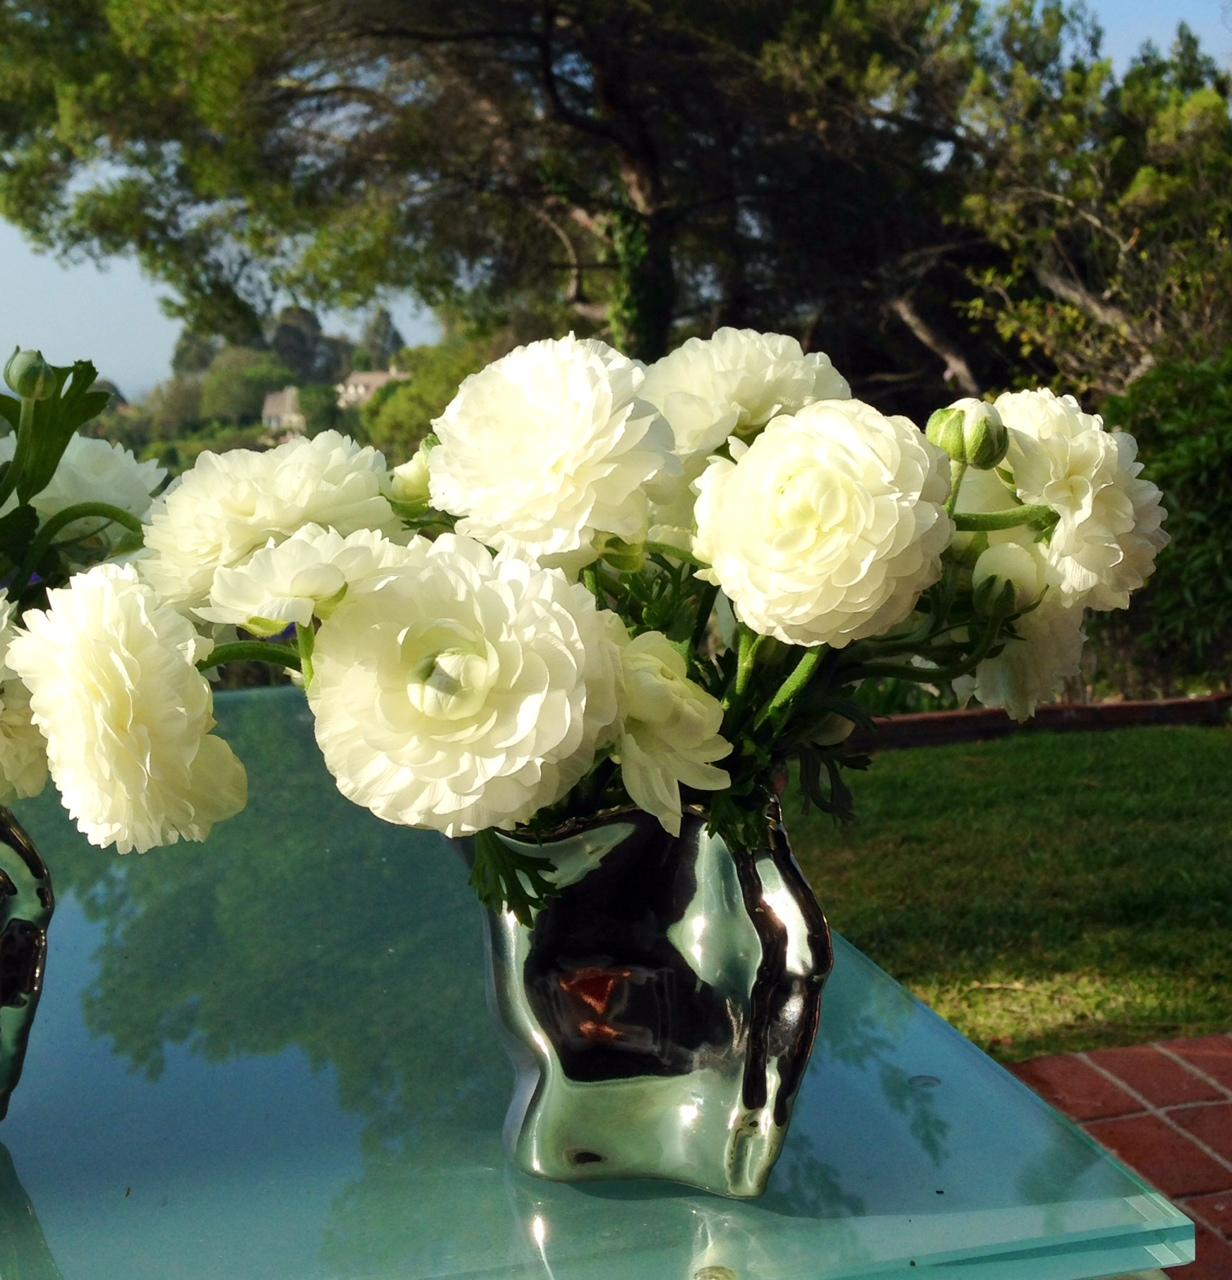 Essie Collection, Molded Mirror Vase $25